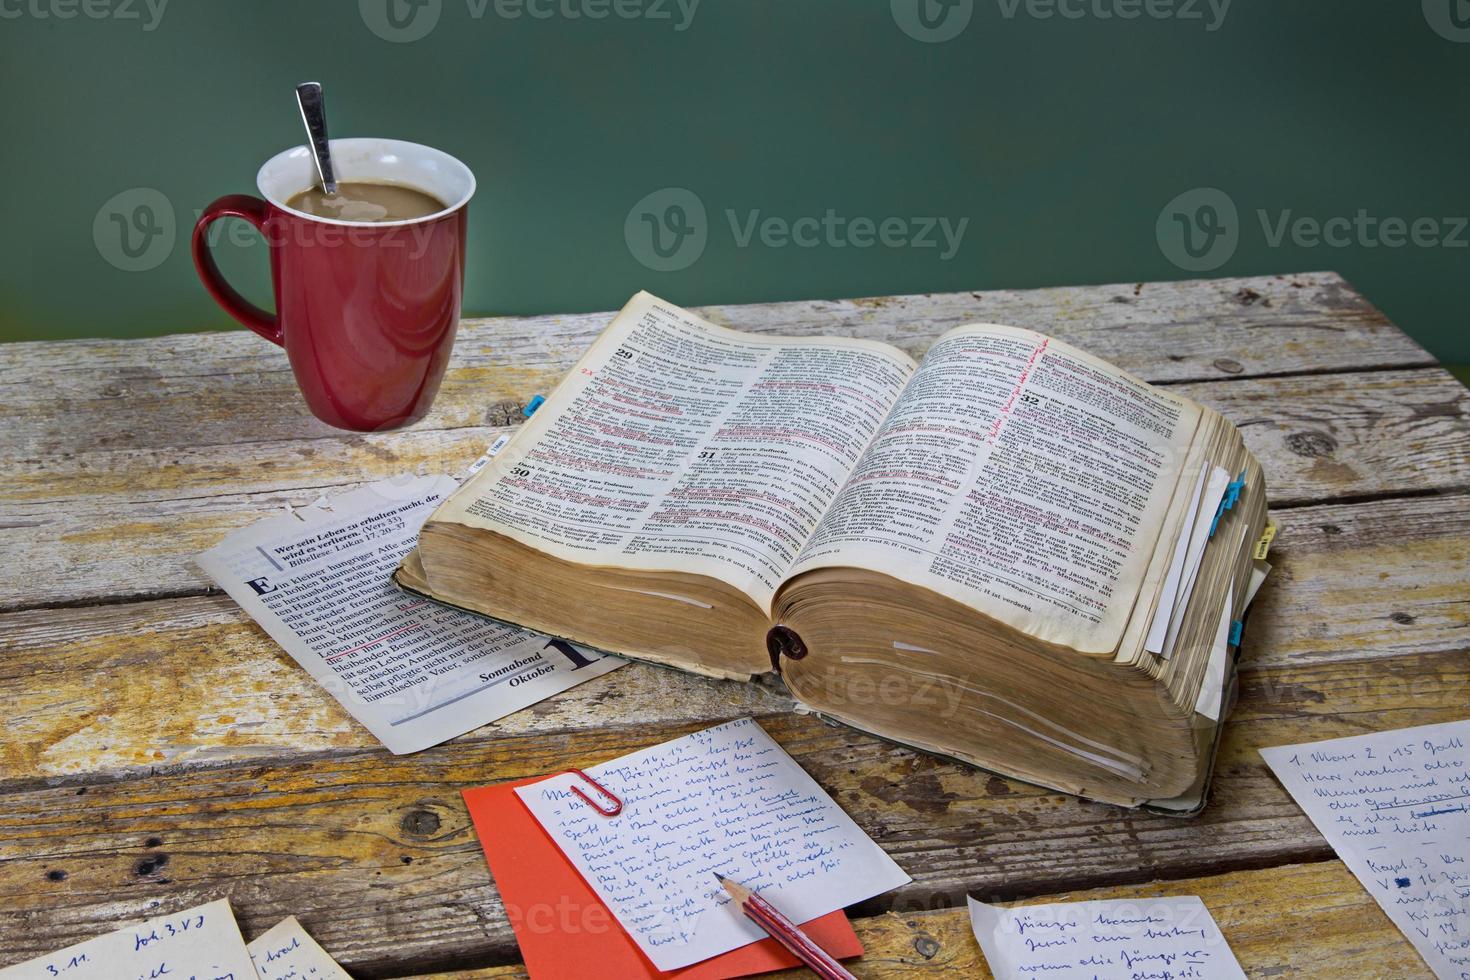 daglig bibelstudie foto